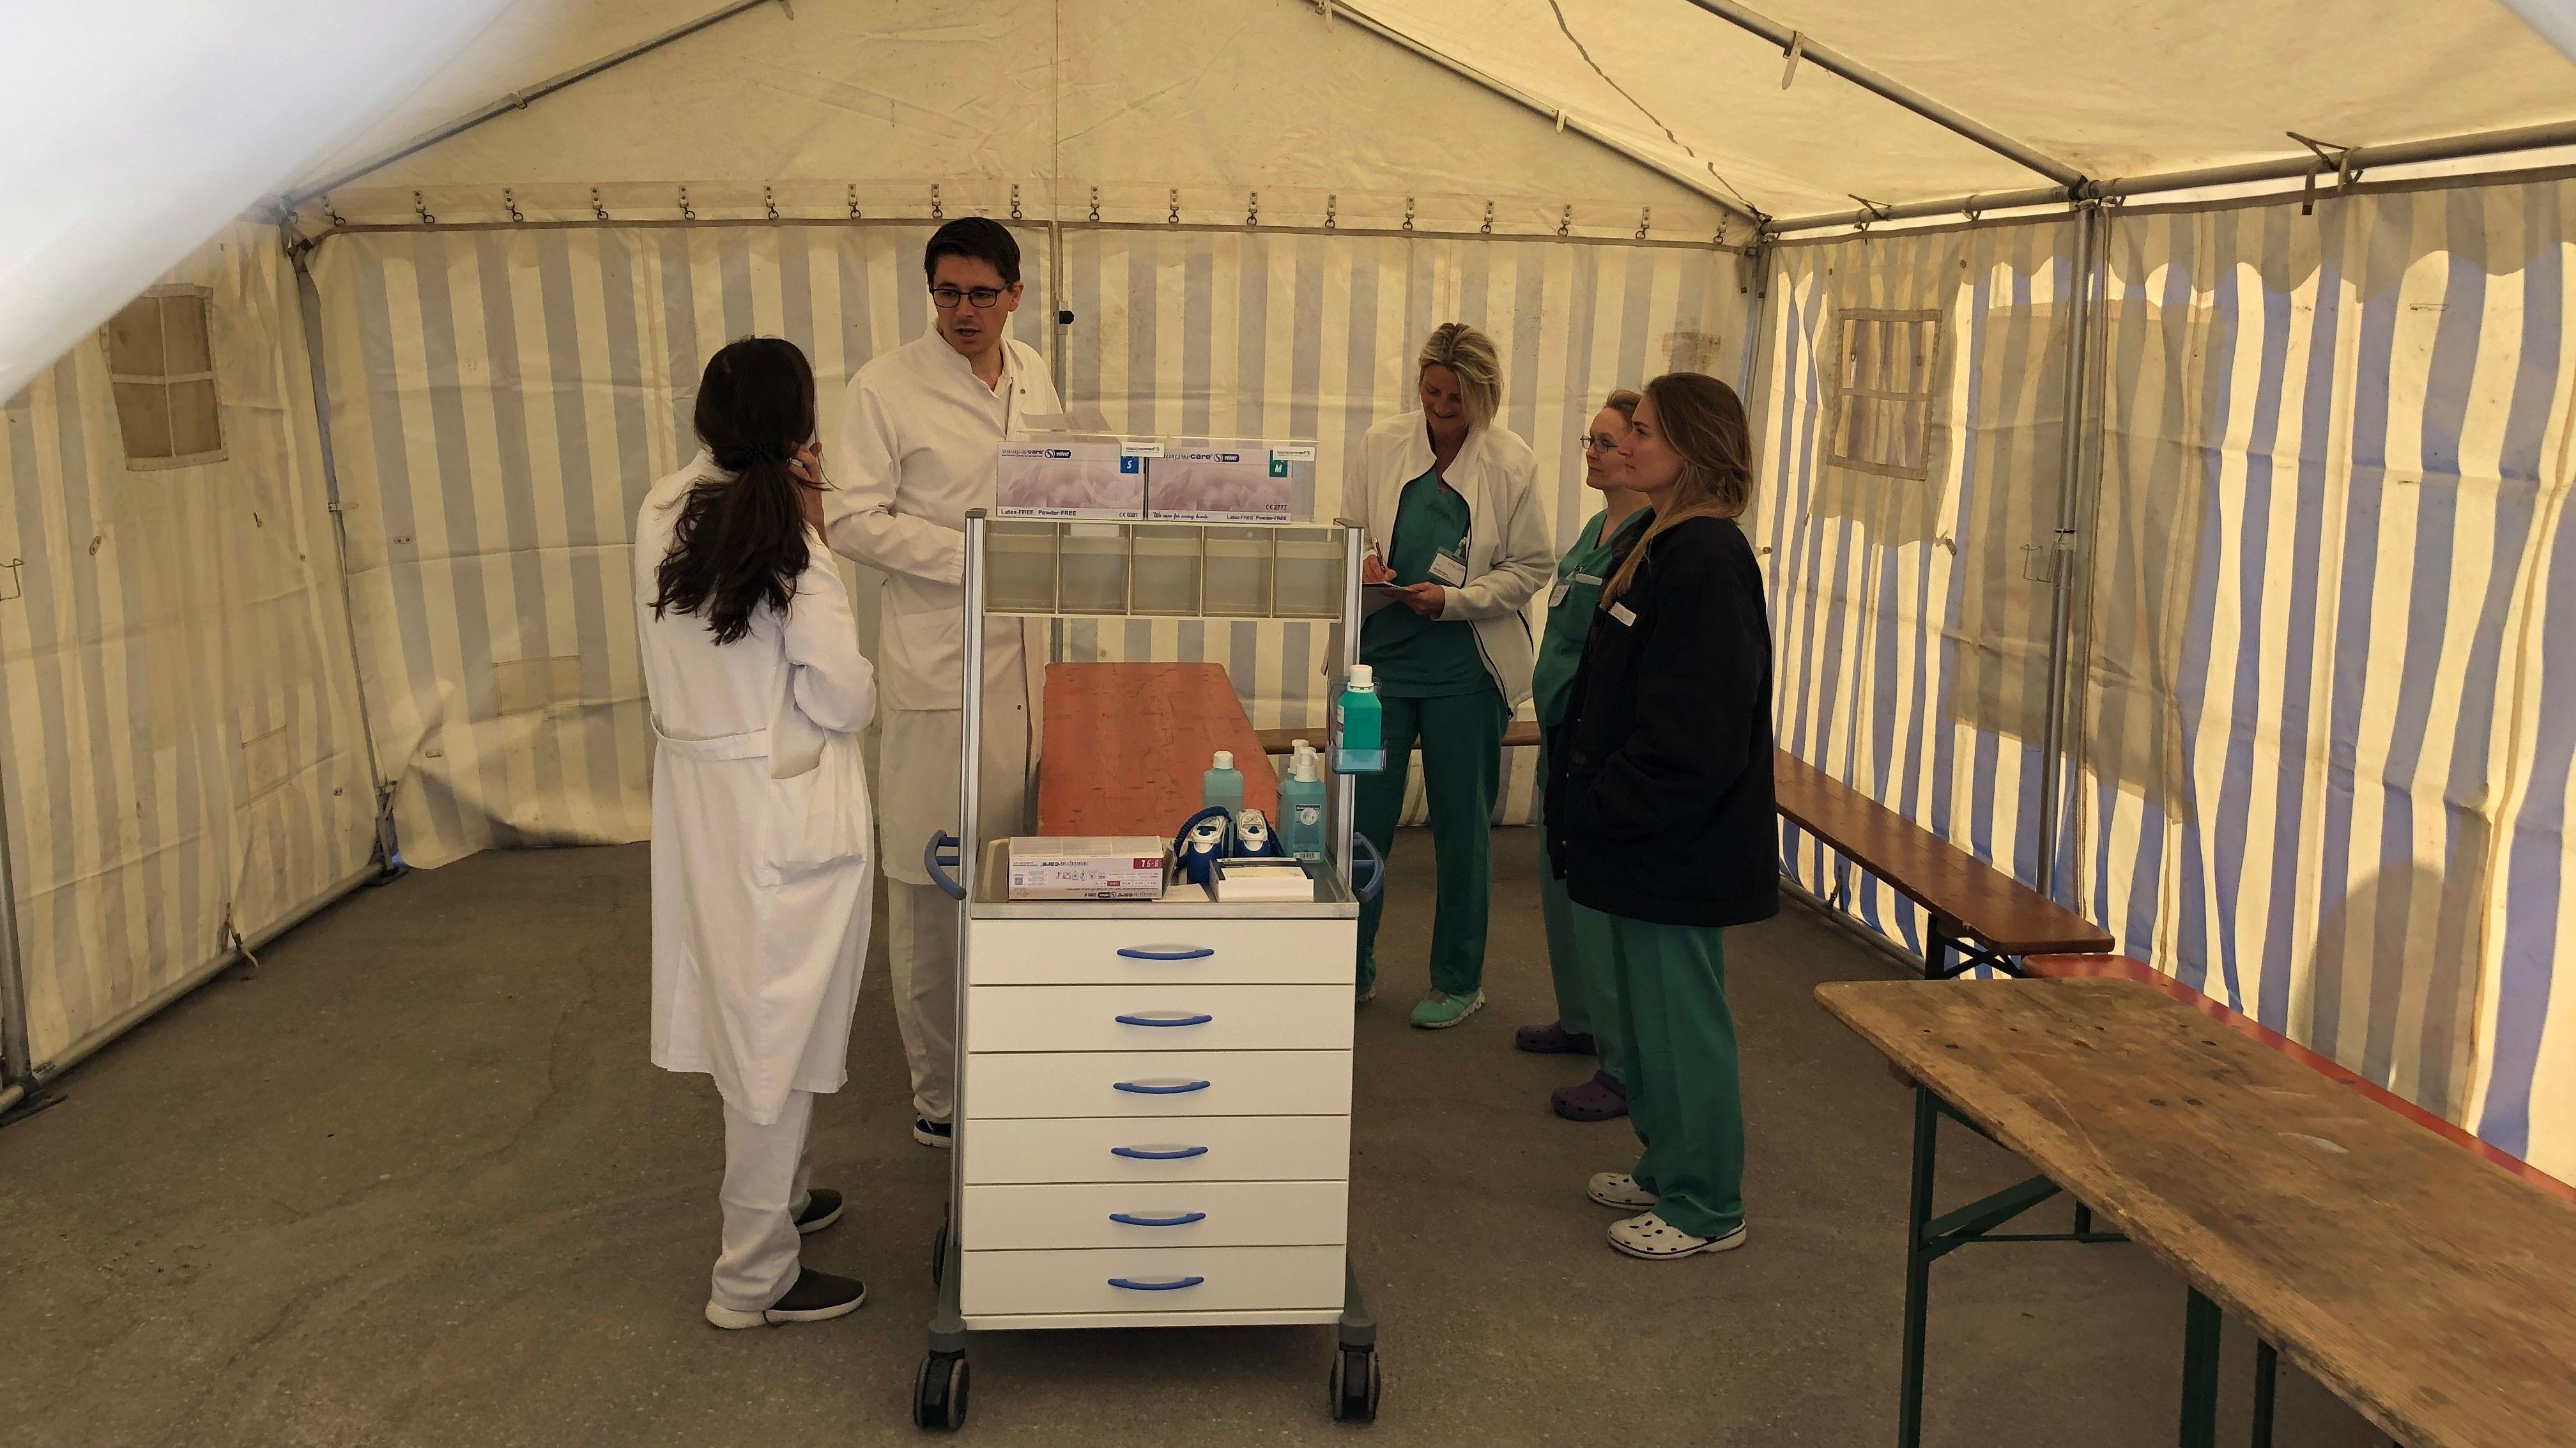 Triage-Zelt mit Klinik-Personal